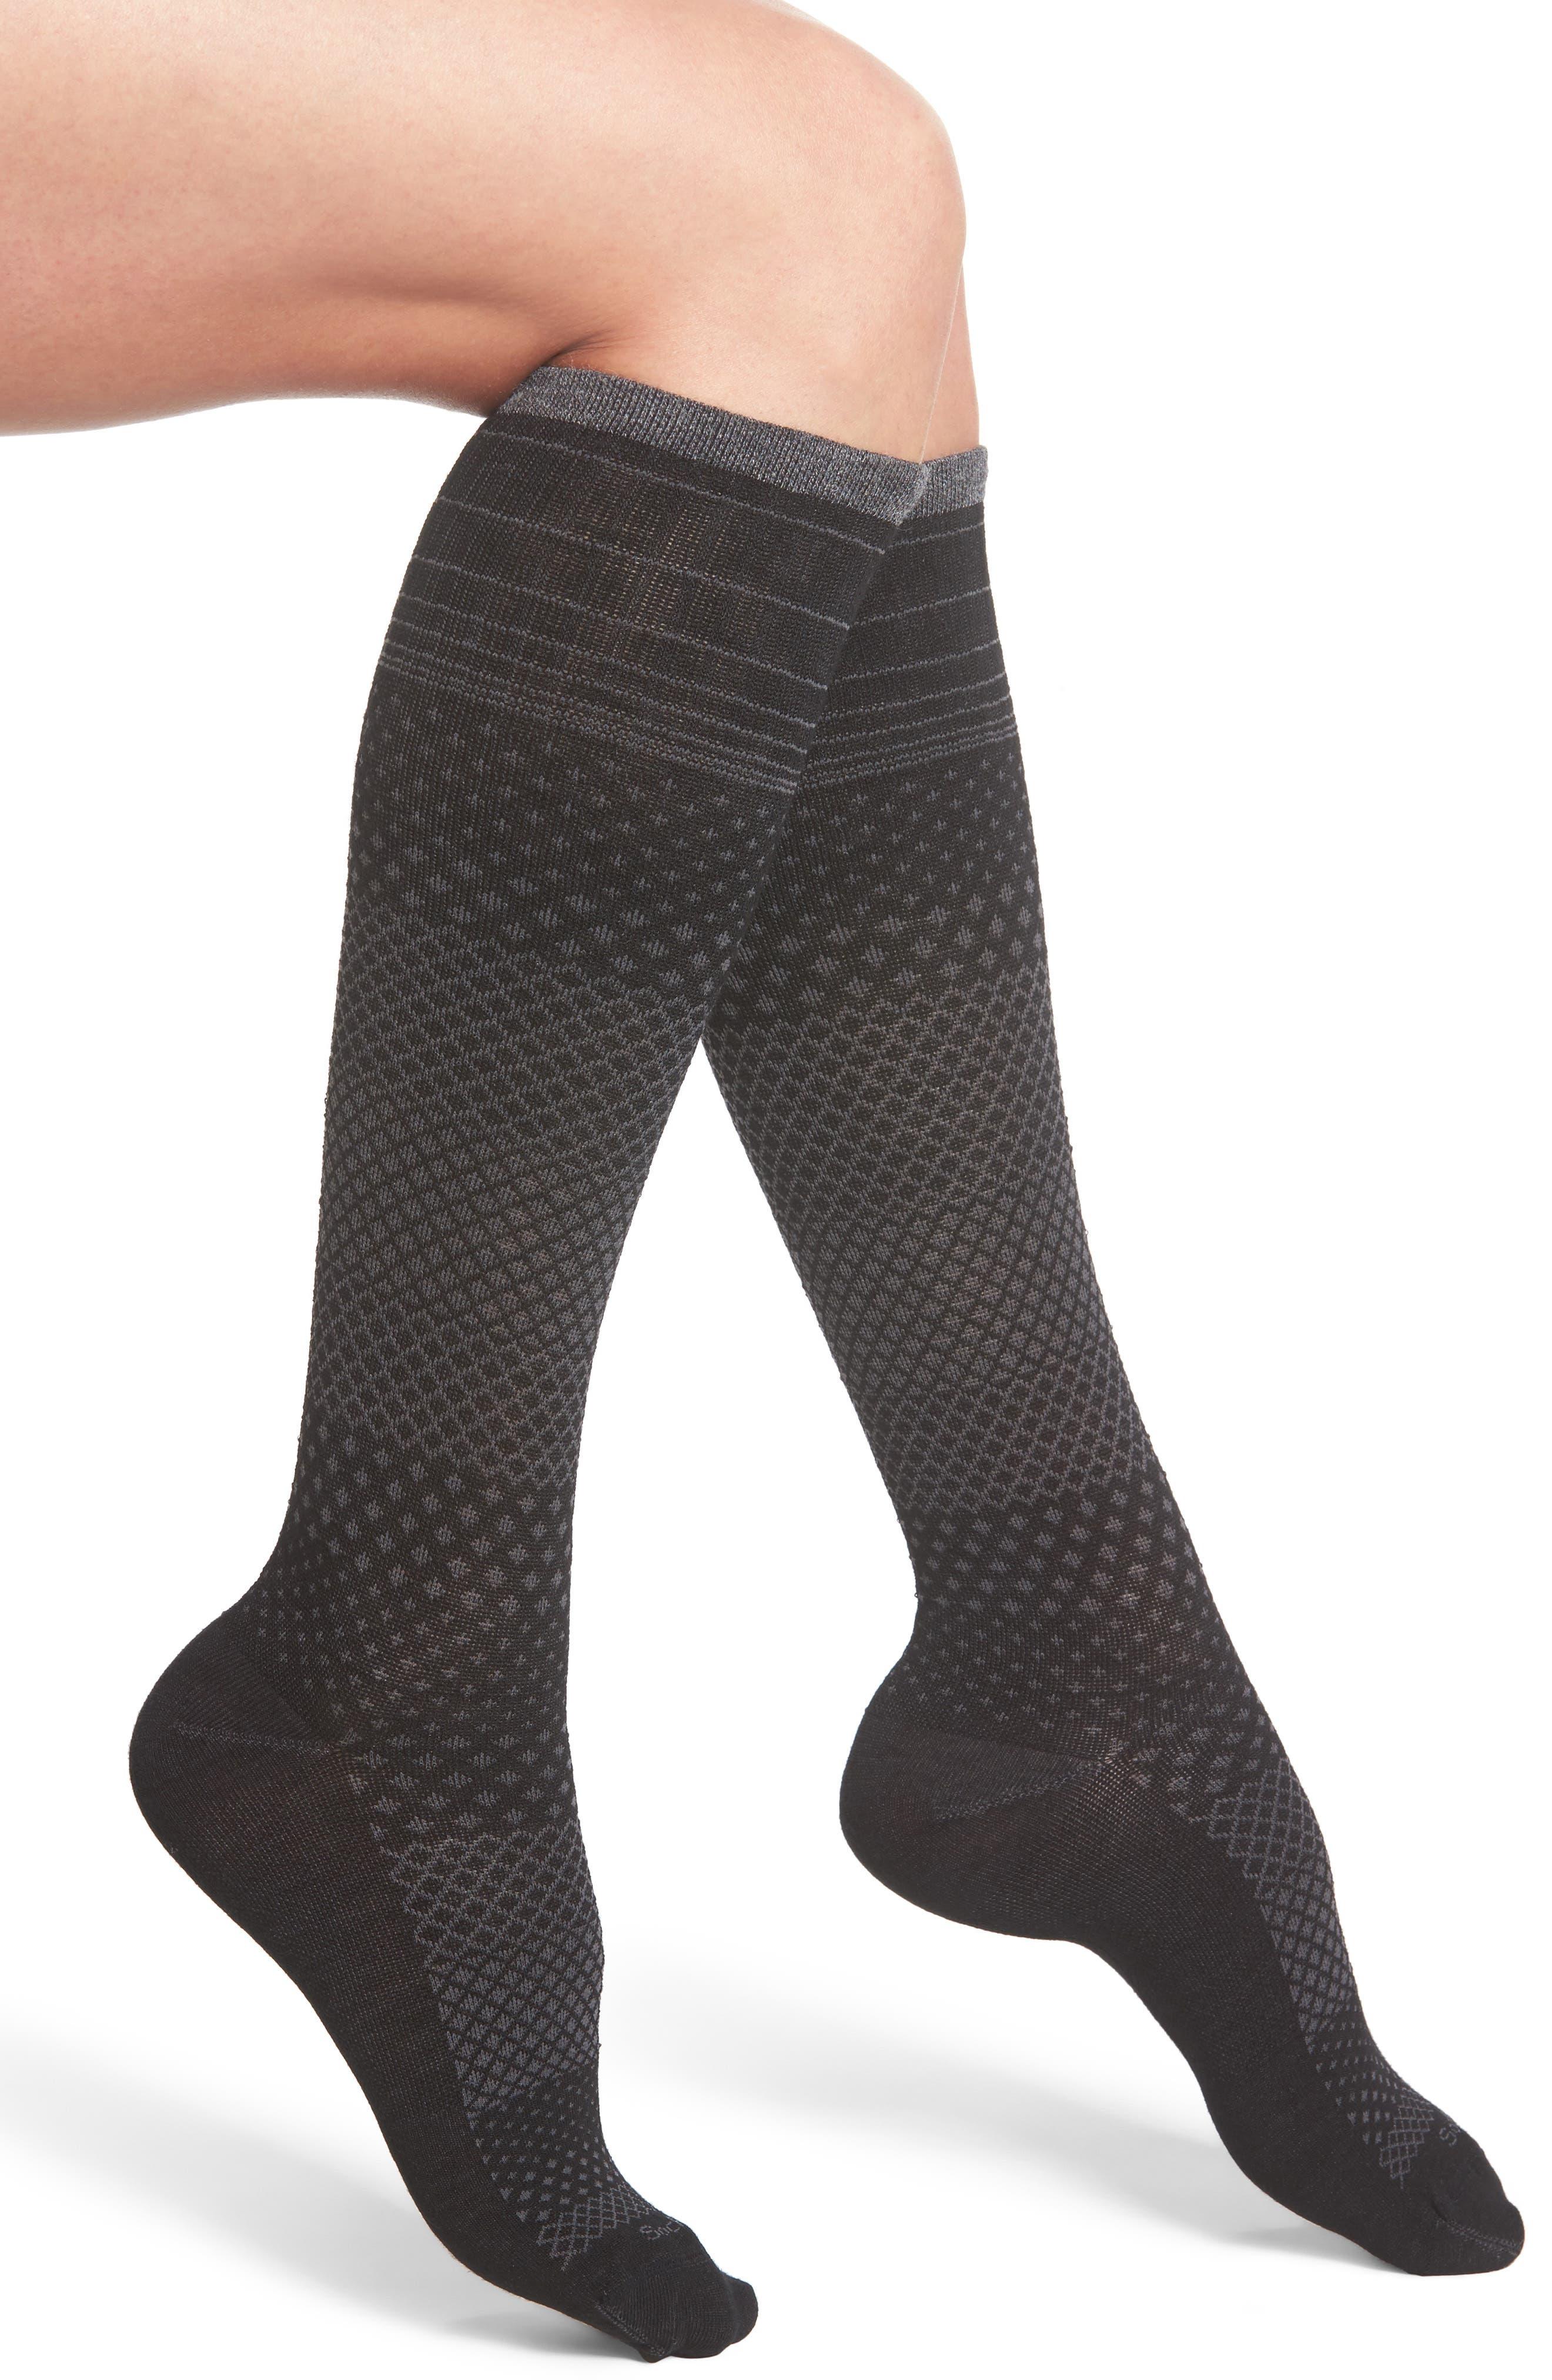 Sockwell Micro Grade Compression Knee Socks